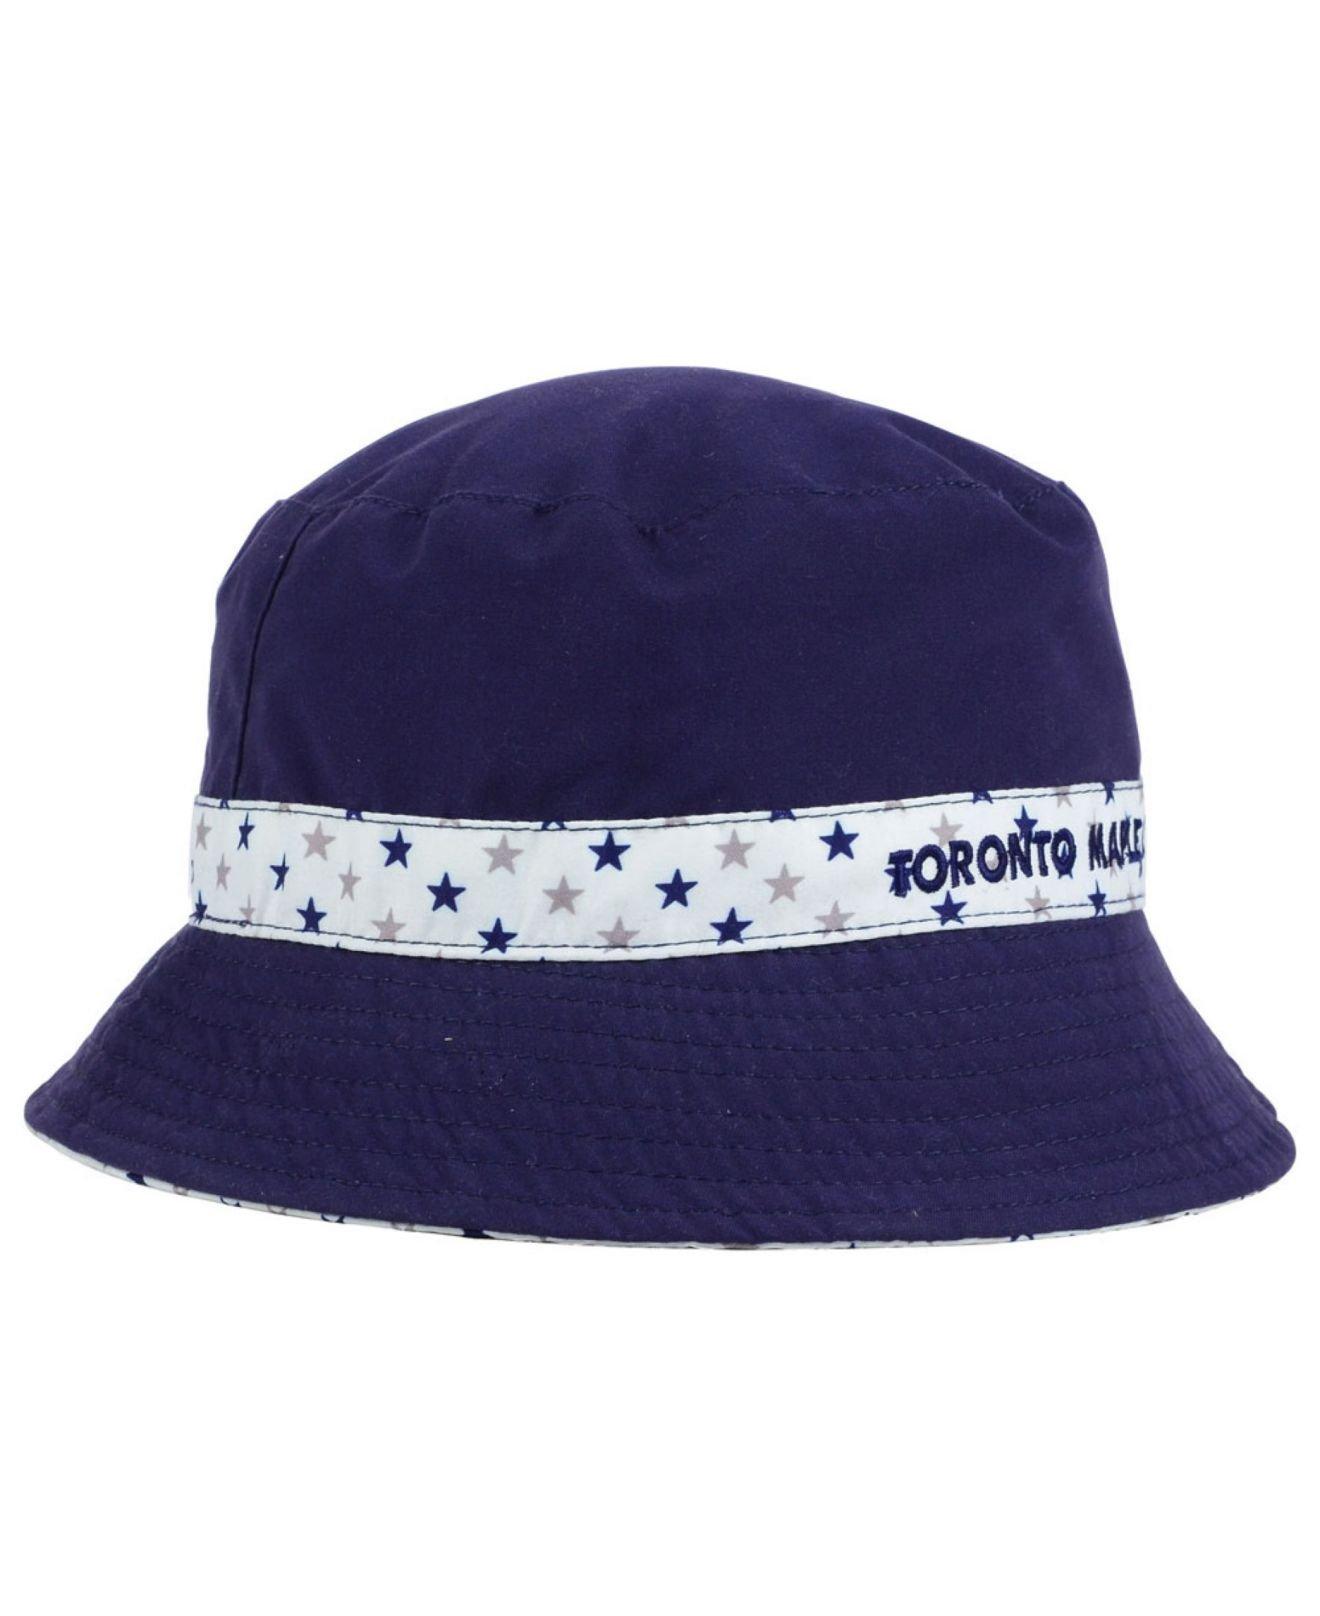 brand new c7742 24ae0 best winnipeg jets bucket hat f82b2 7edc2